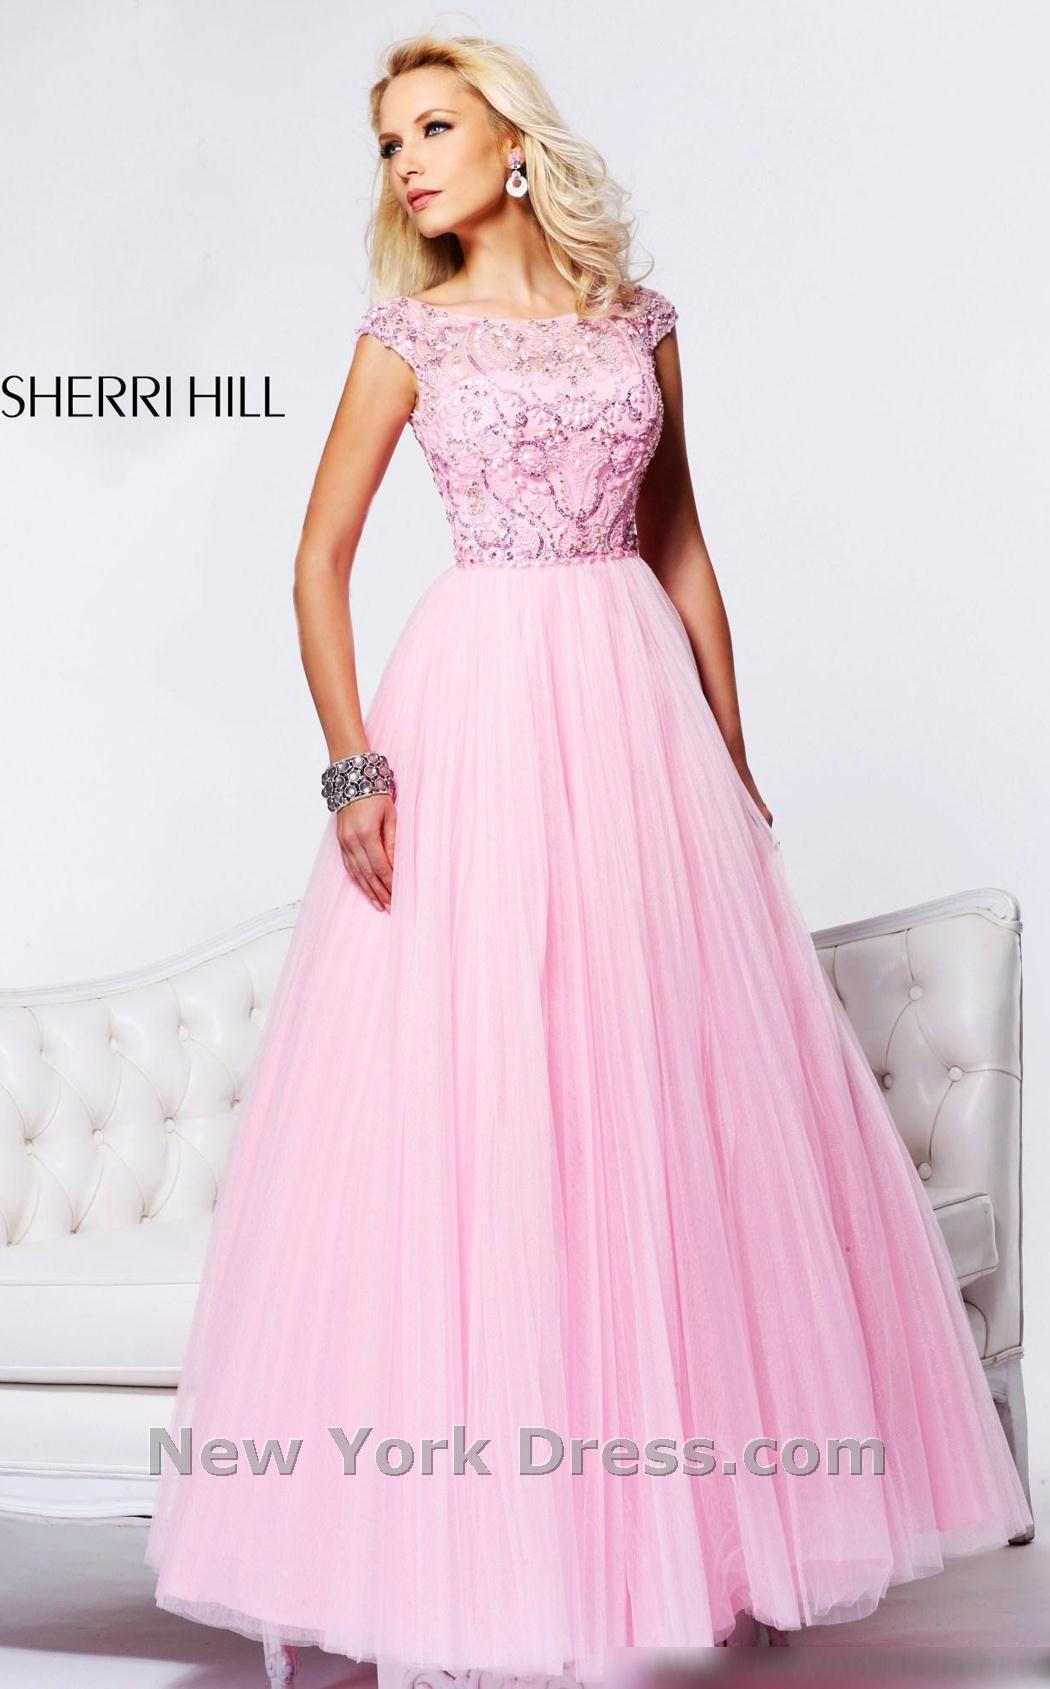 sherri hill longos - Pesquisa Google | Vestidos de festa | Pinterest ...